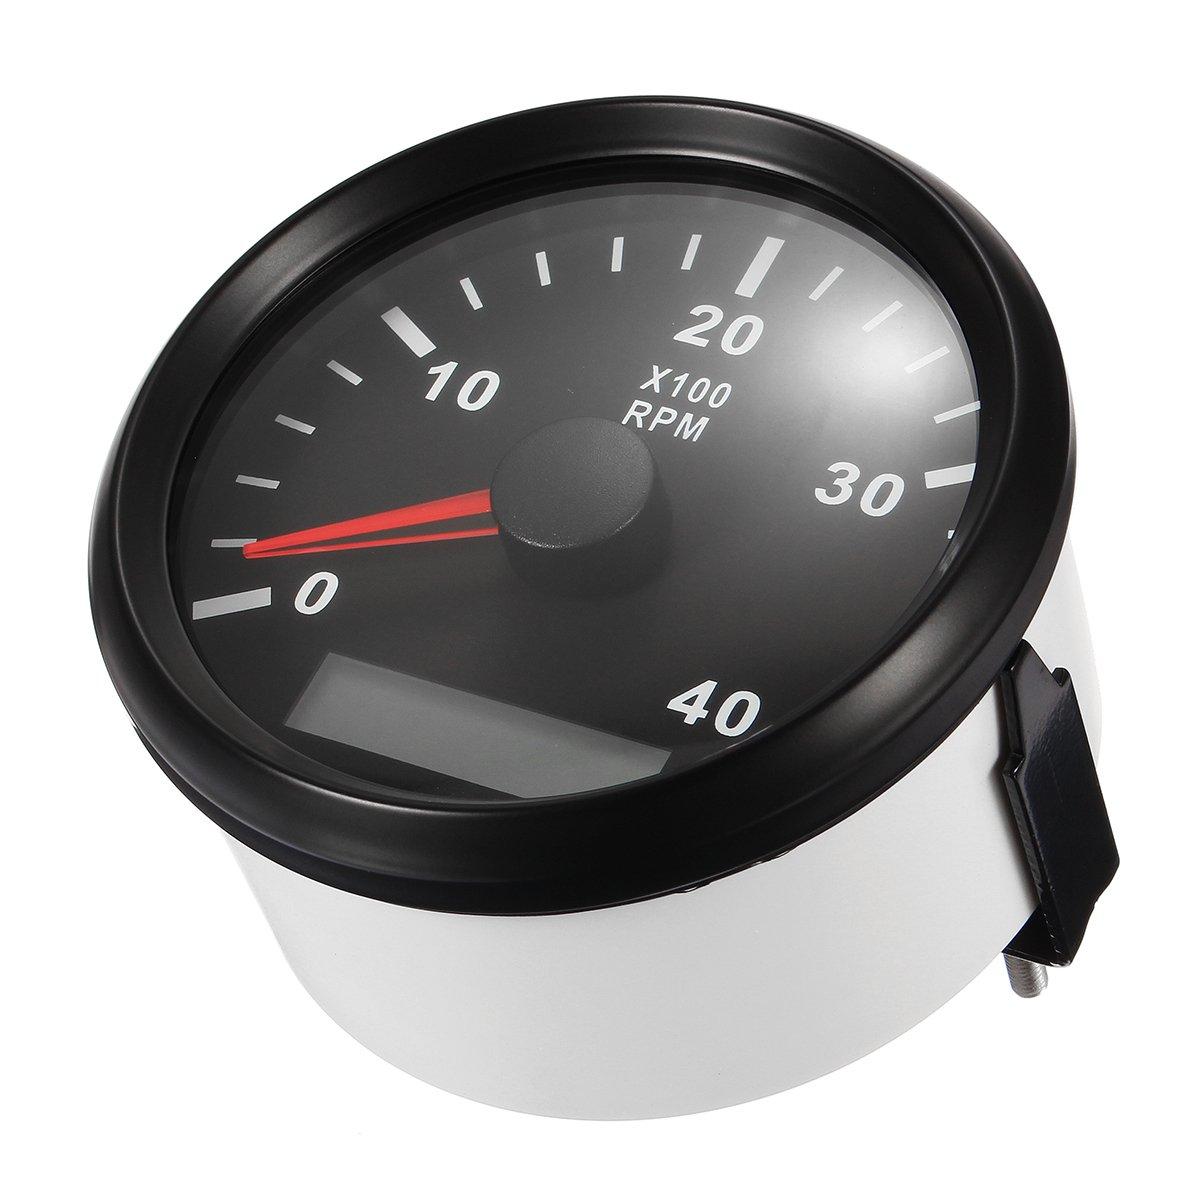 NeDonald 12/24V Marine Tachometer Boat Tacho Meter Gauge LCD Hourmeter 0-4000 RPM 85mm by NeDonald (Image #3)